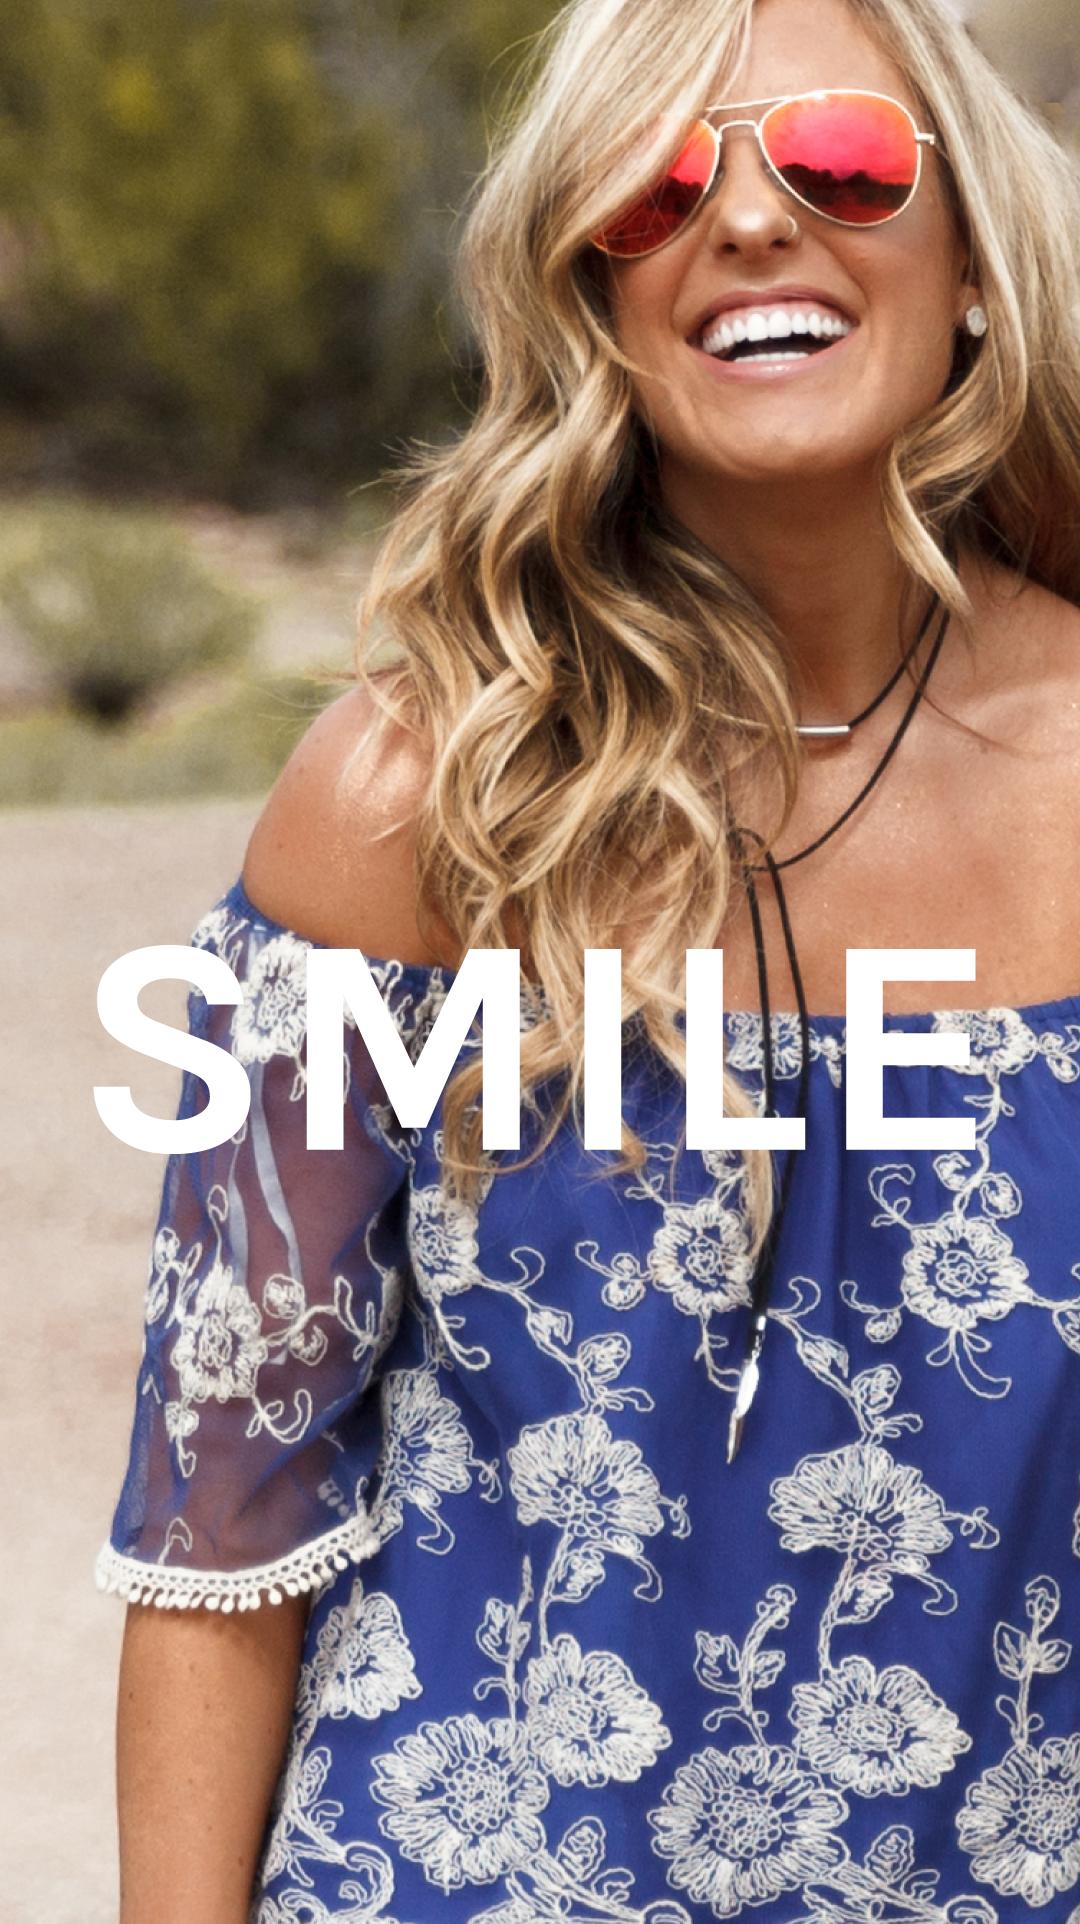 Smile_1b.png